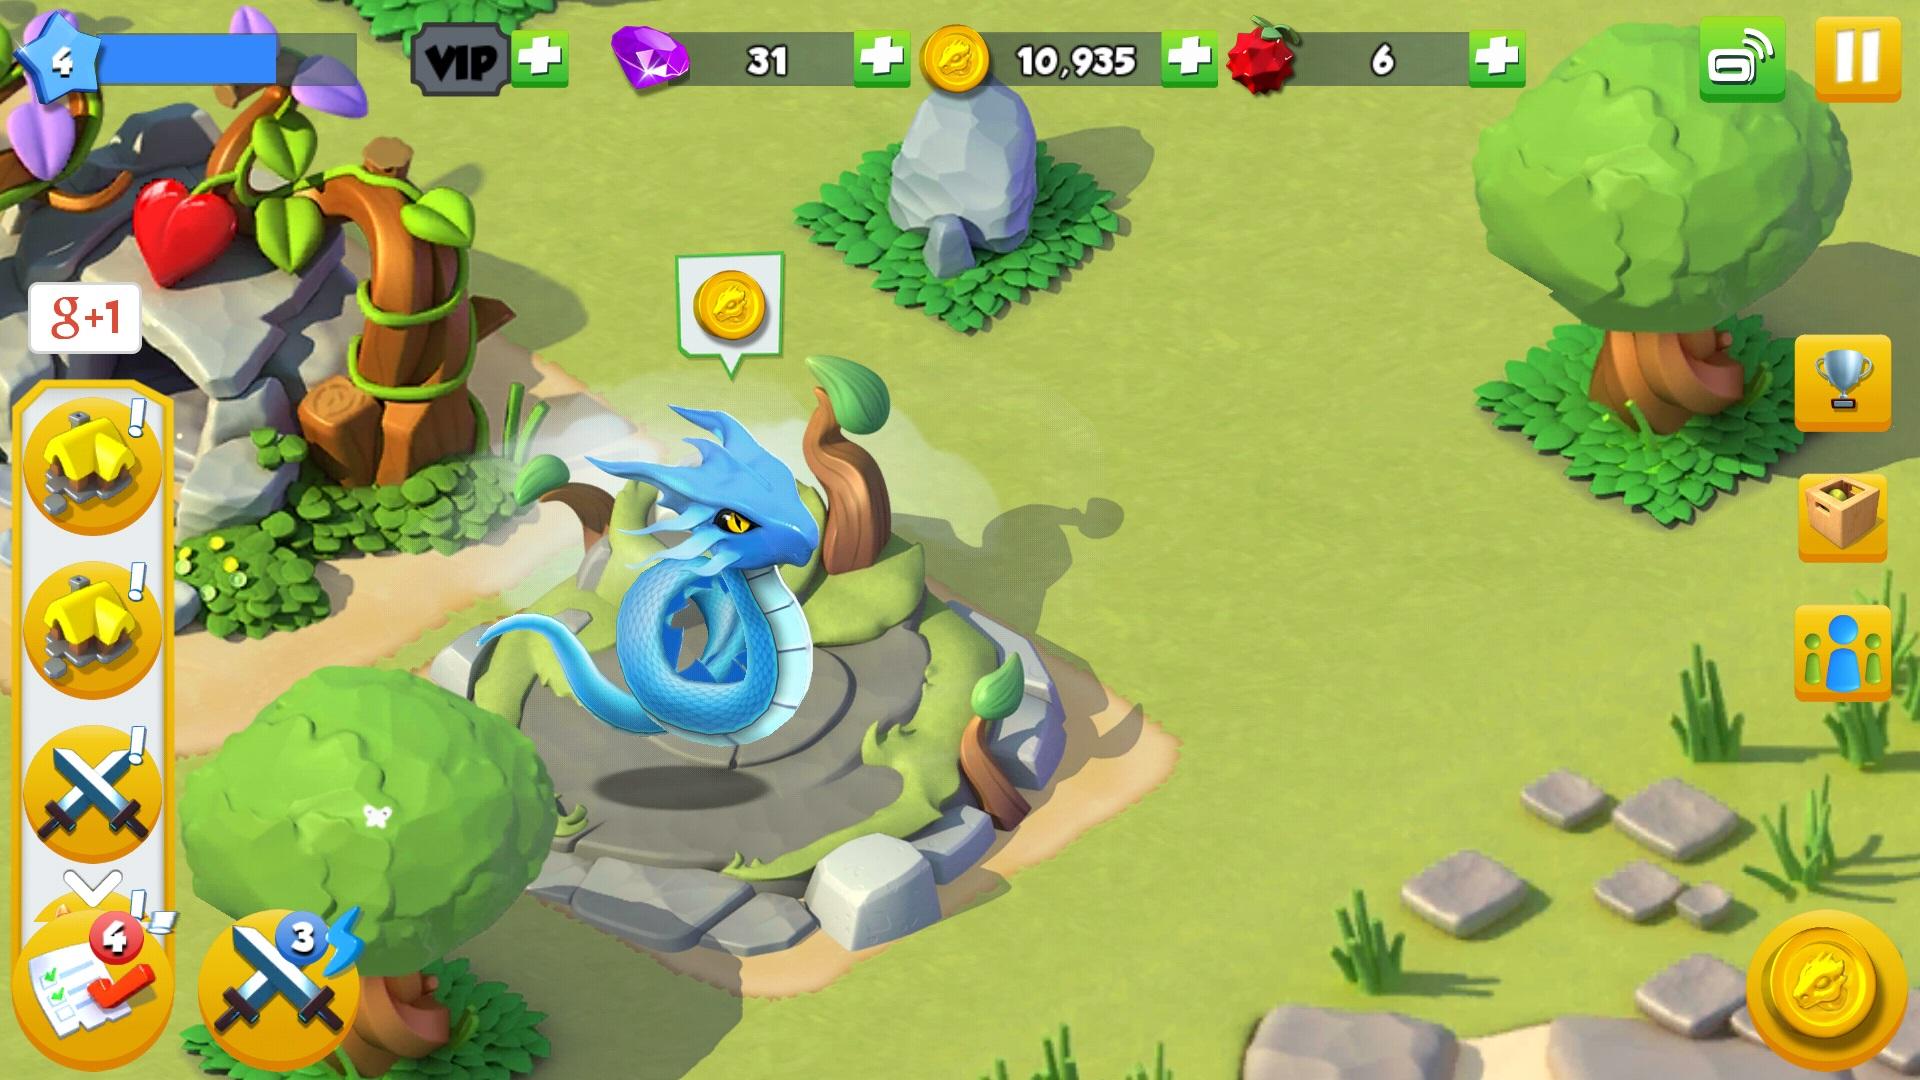 Download game dragon mania legends offline windows 7